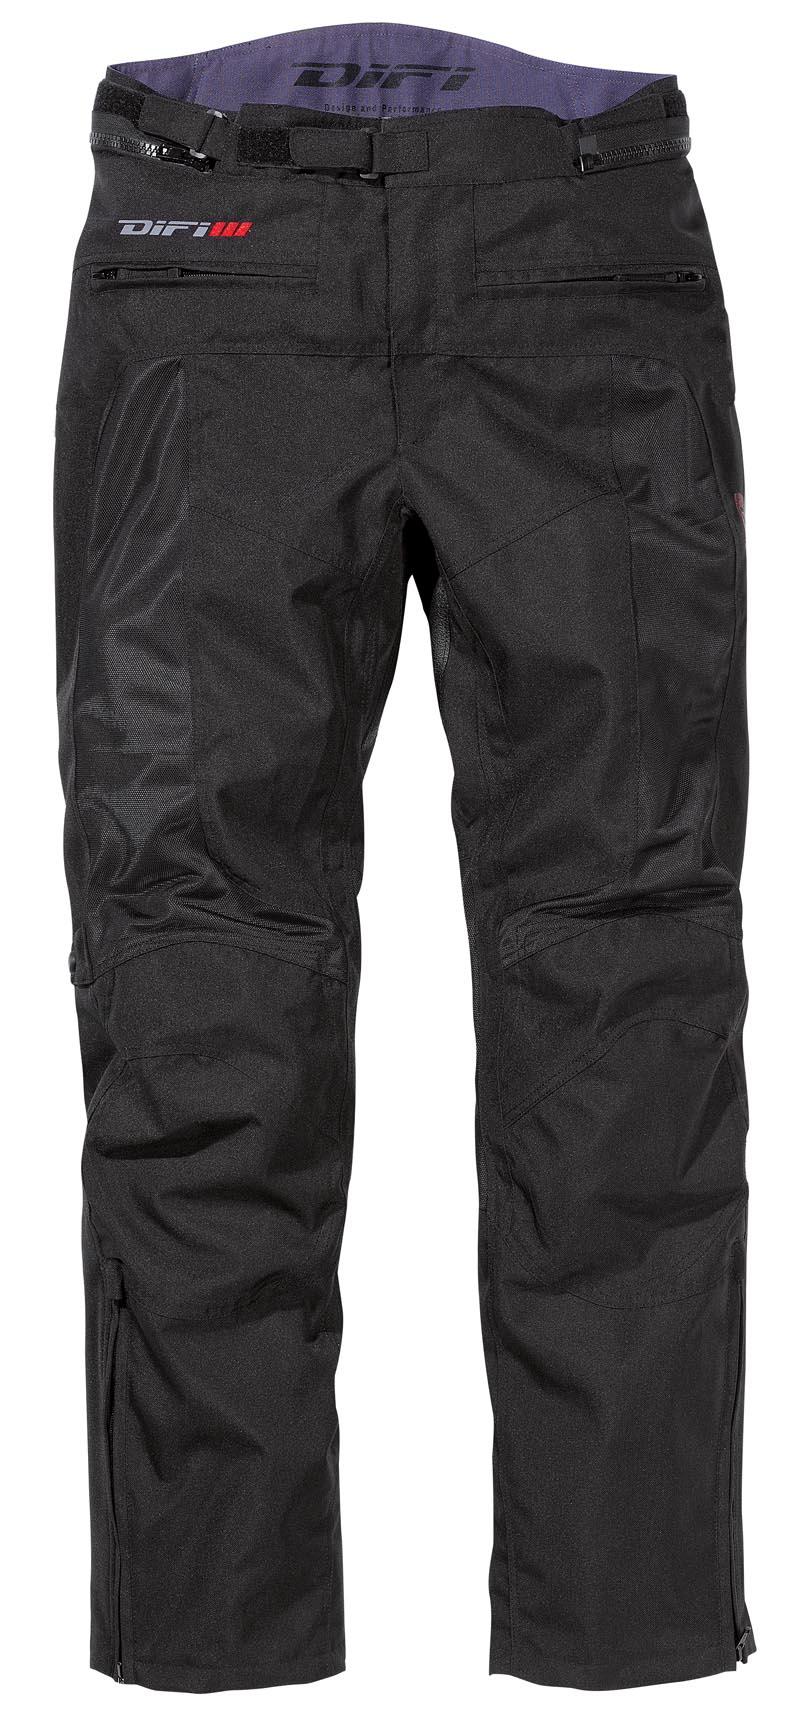 Pantalon femme FLORIDA noir - Difi